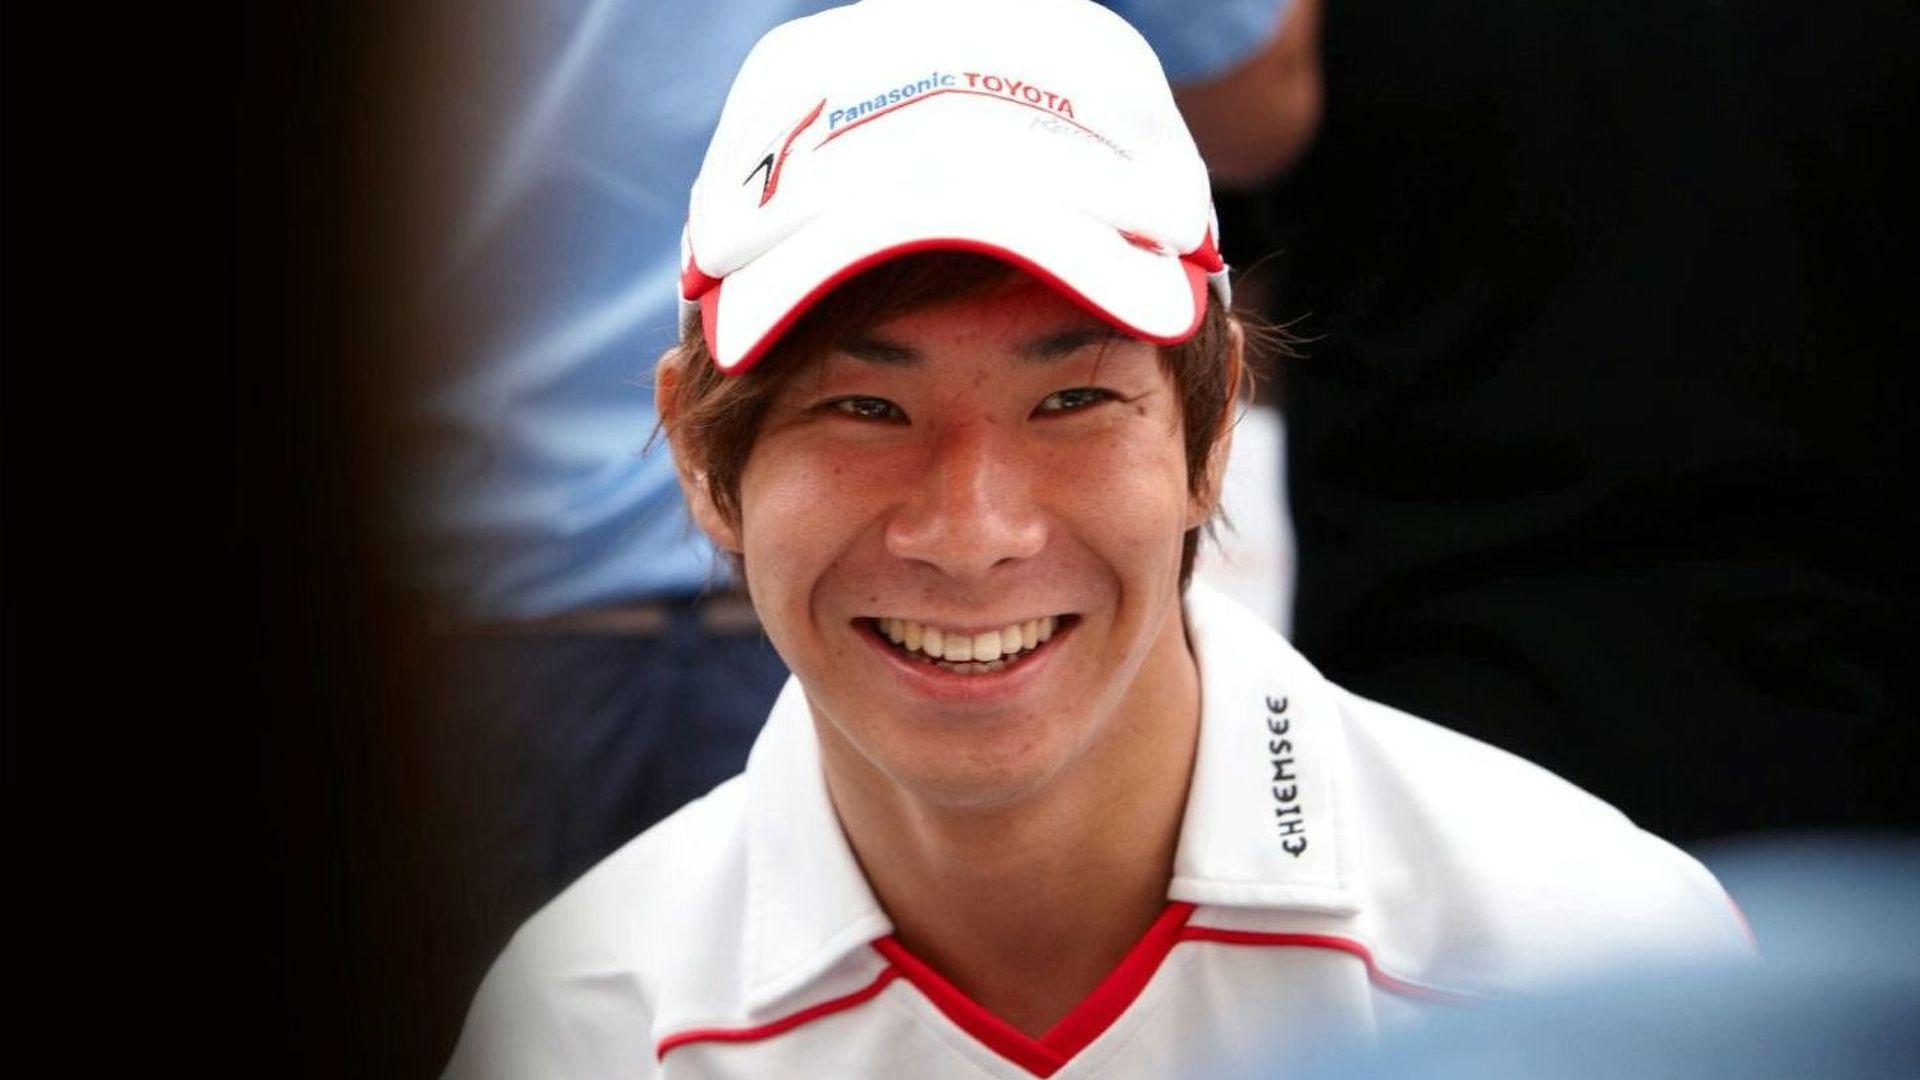 Howett admits Kobayashi likely for 2010 seat